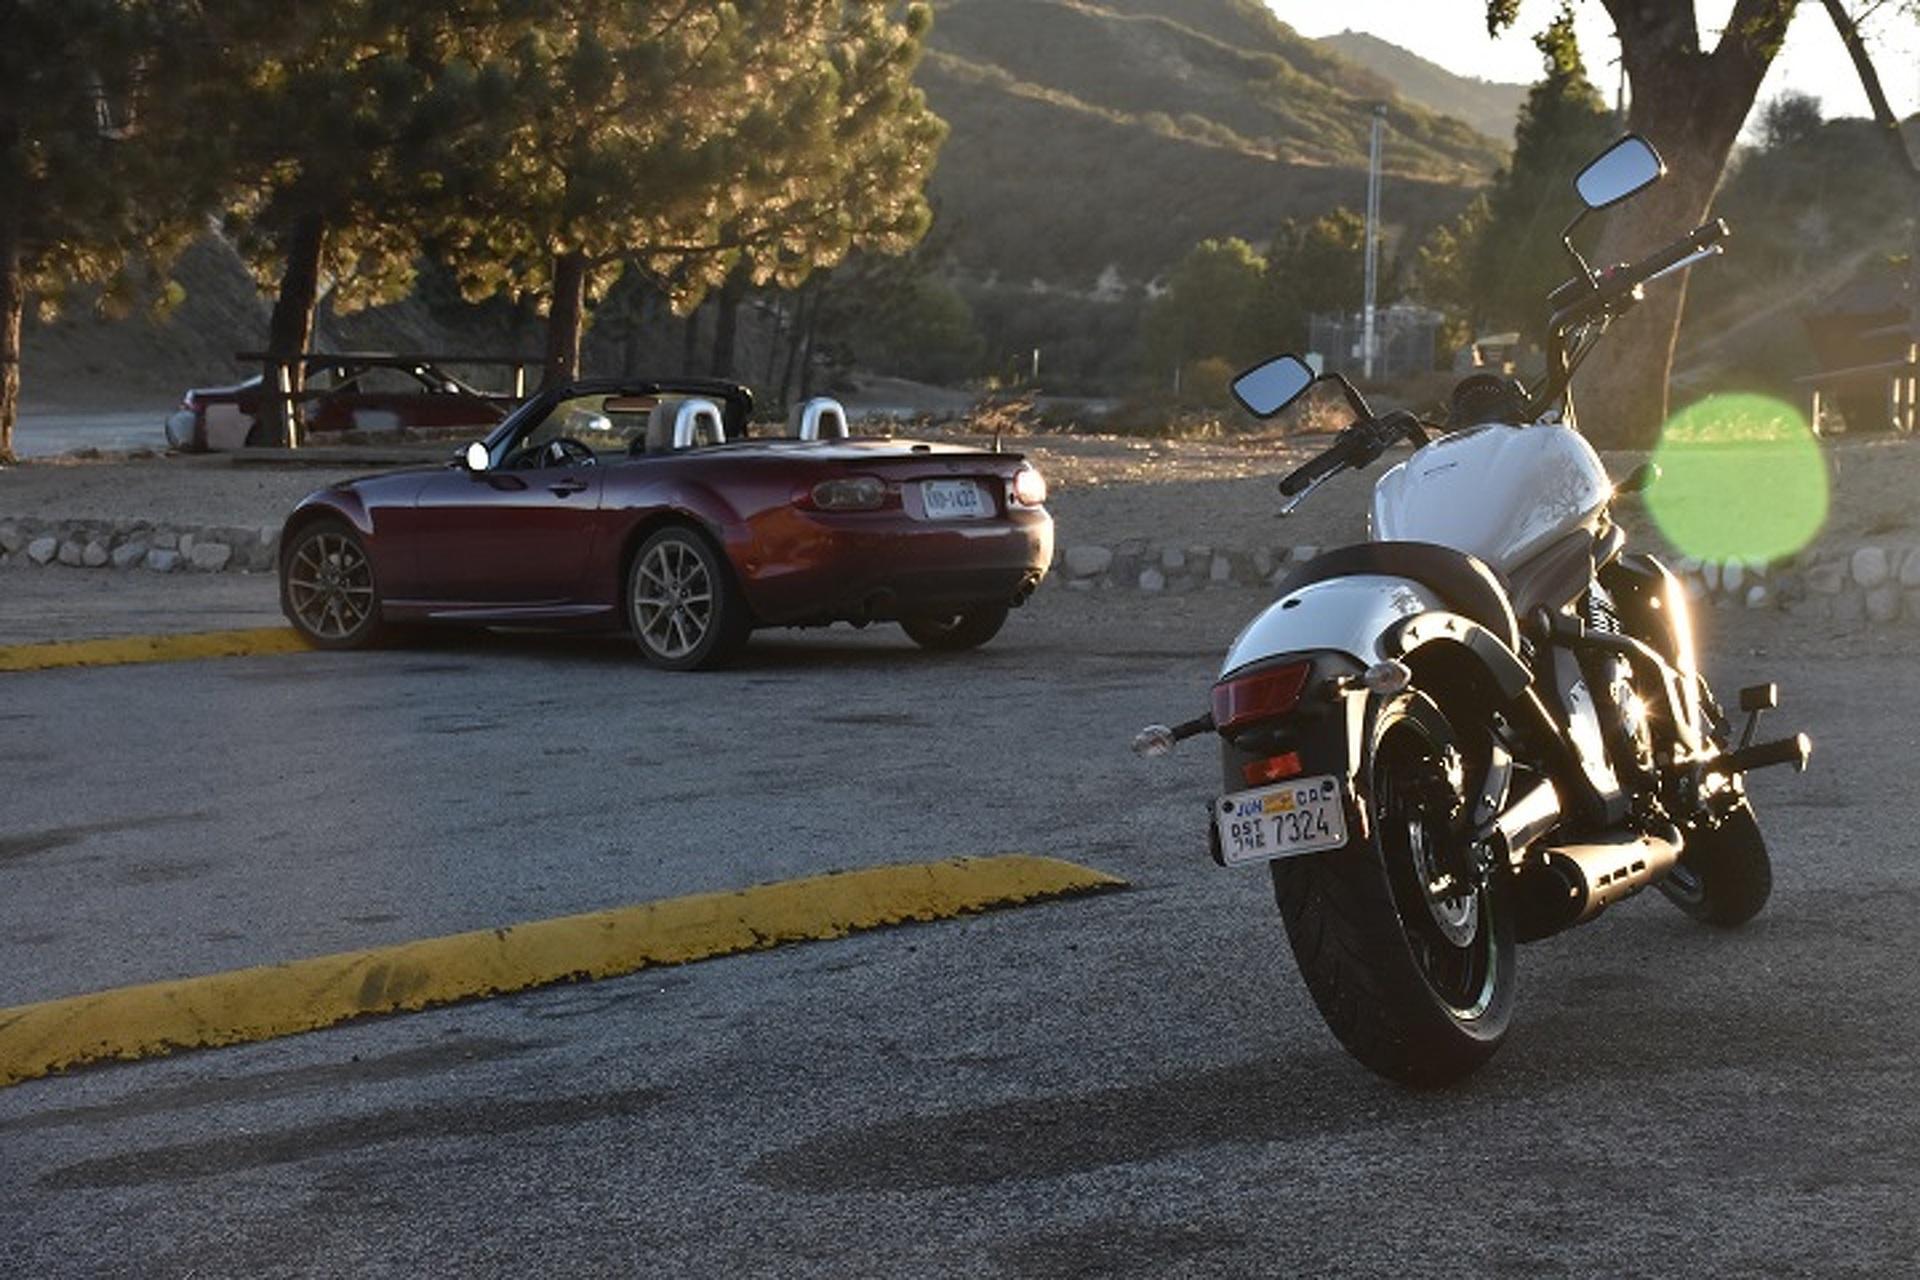 The Kawasaki Vulcan S Will Convince You to Ride